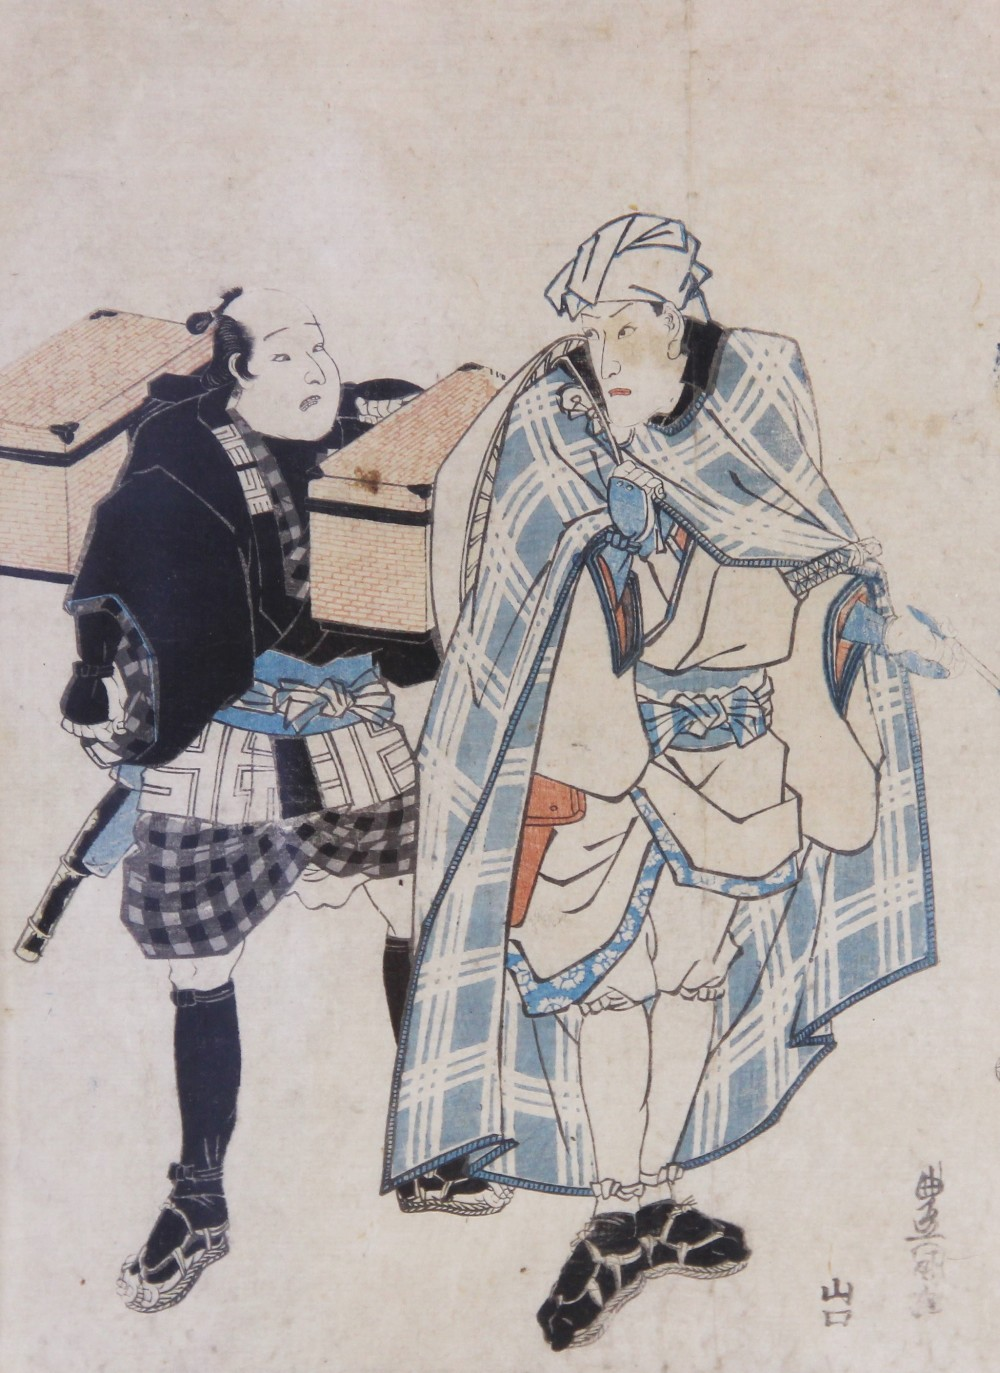 A Japanese Ukiyo-e school woodblock print, late 18th or early 19th century, attributed to Utagawa - Image 2 of 4